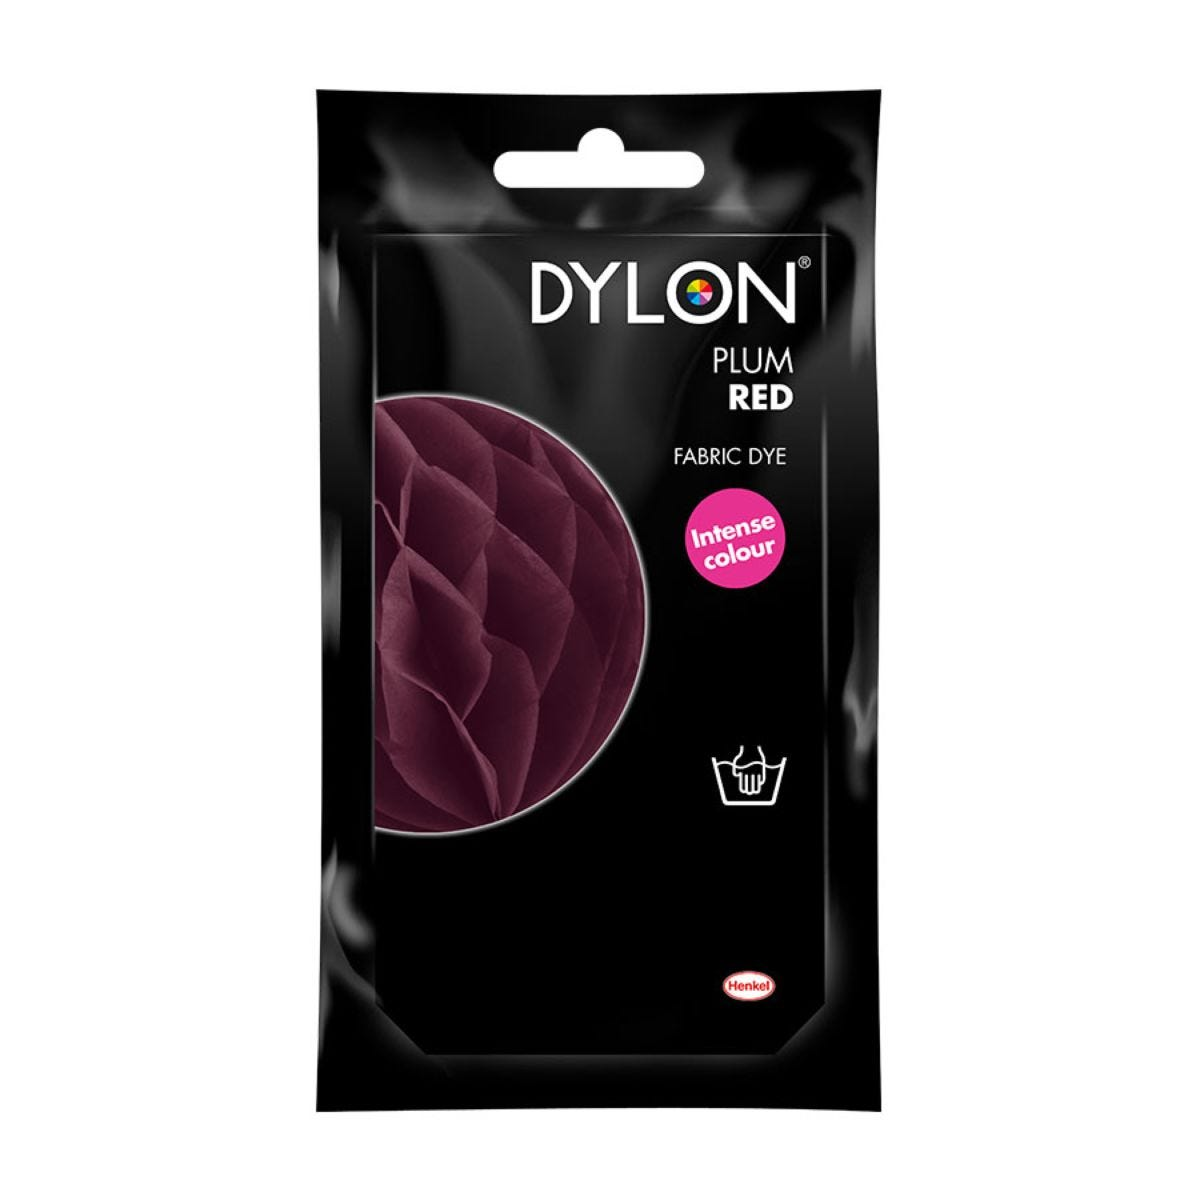 Dylon Hand Dye - Plum Red